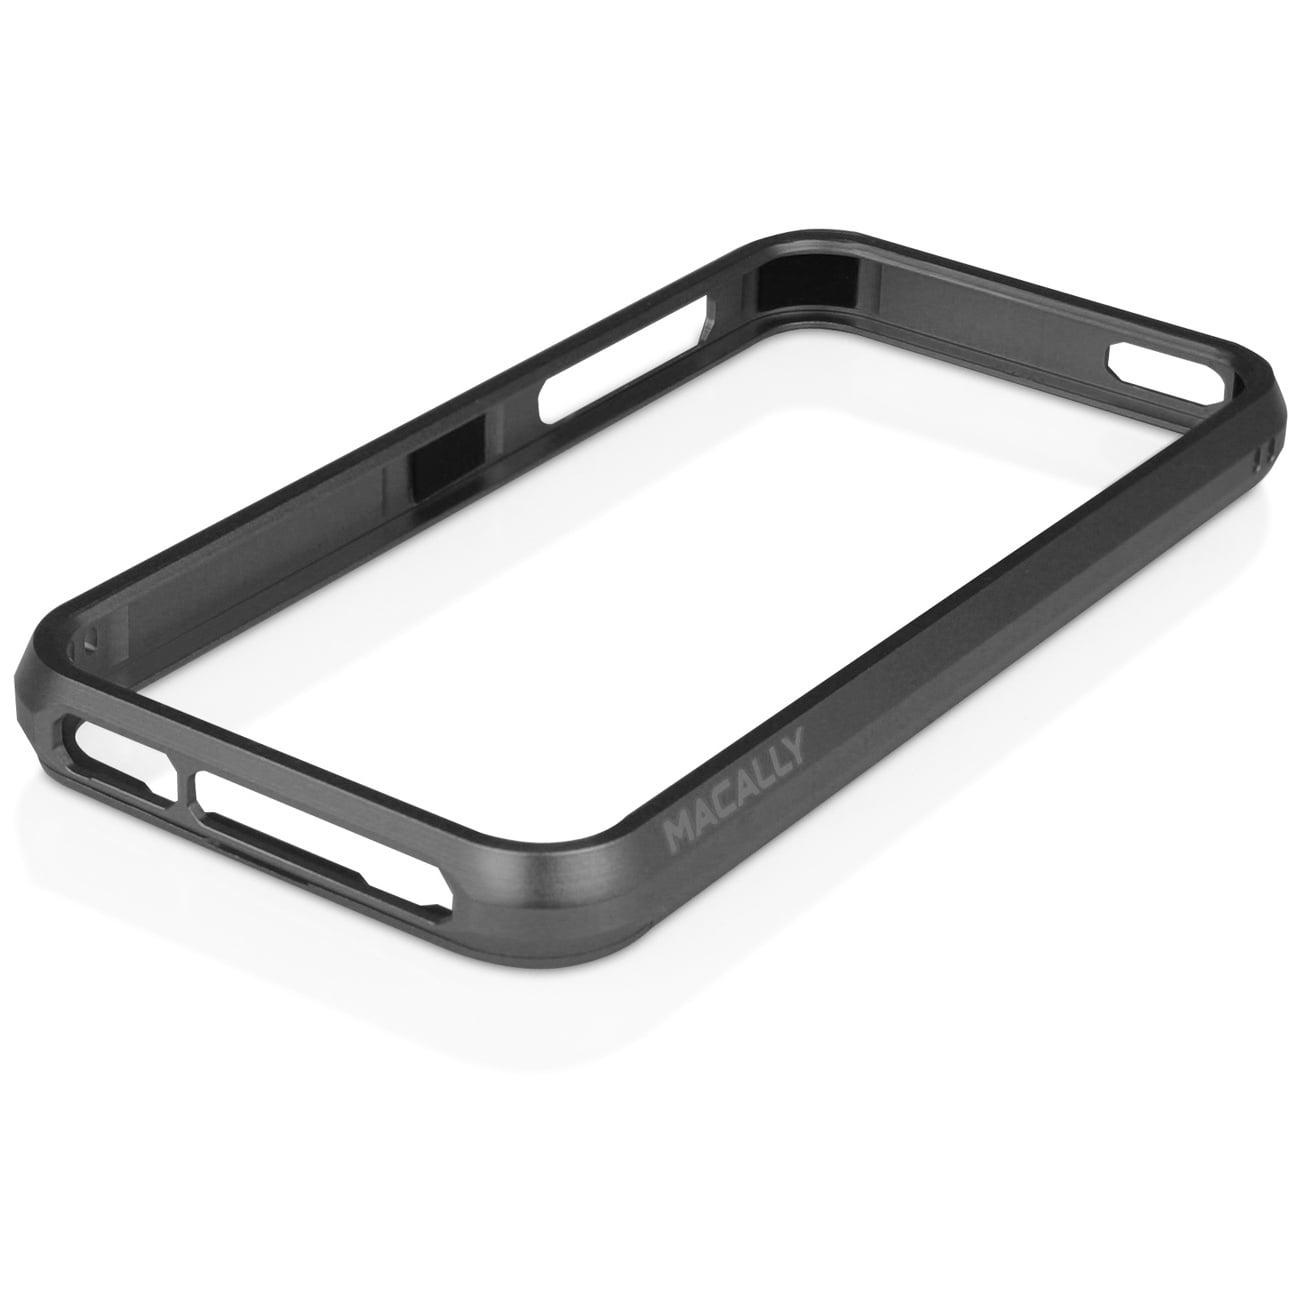 Aluminum Frame Case (Black Color)